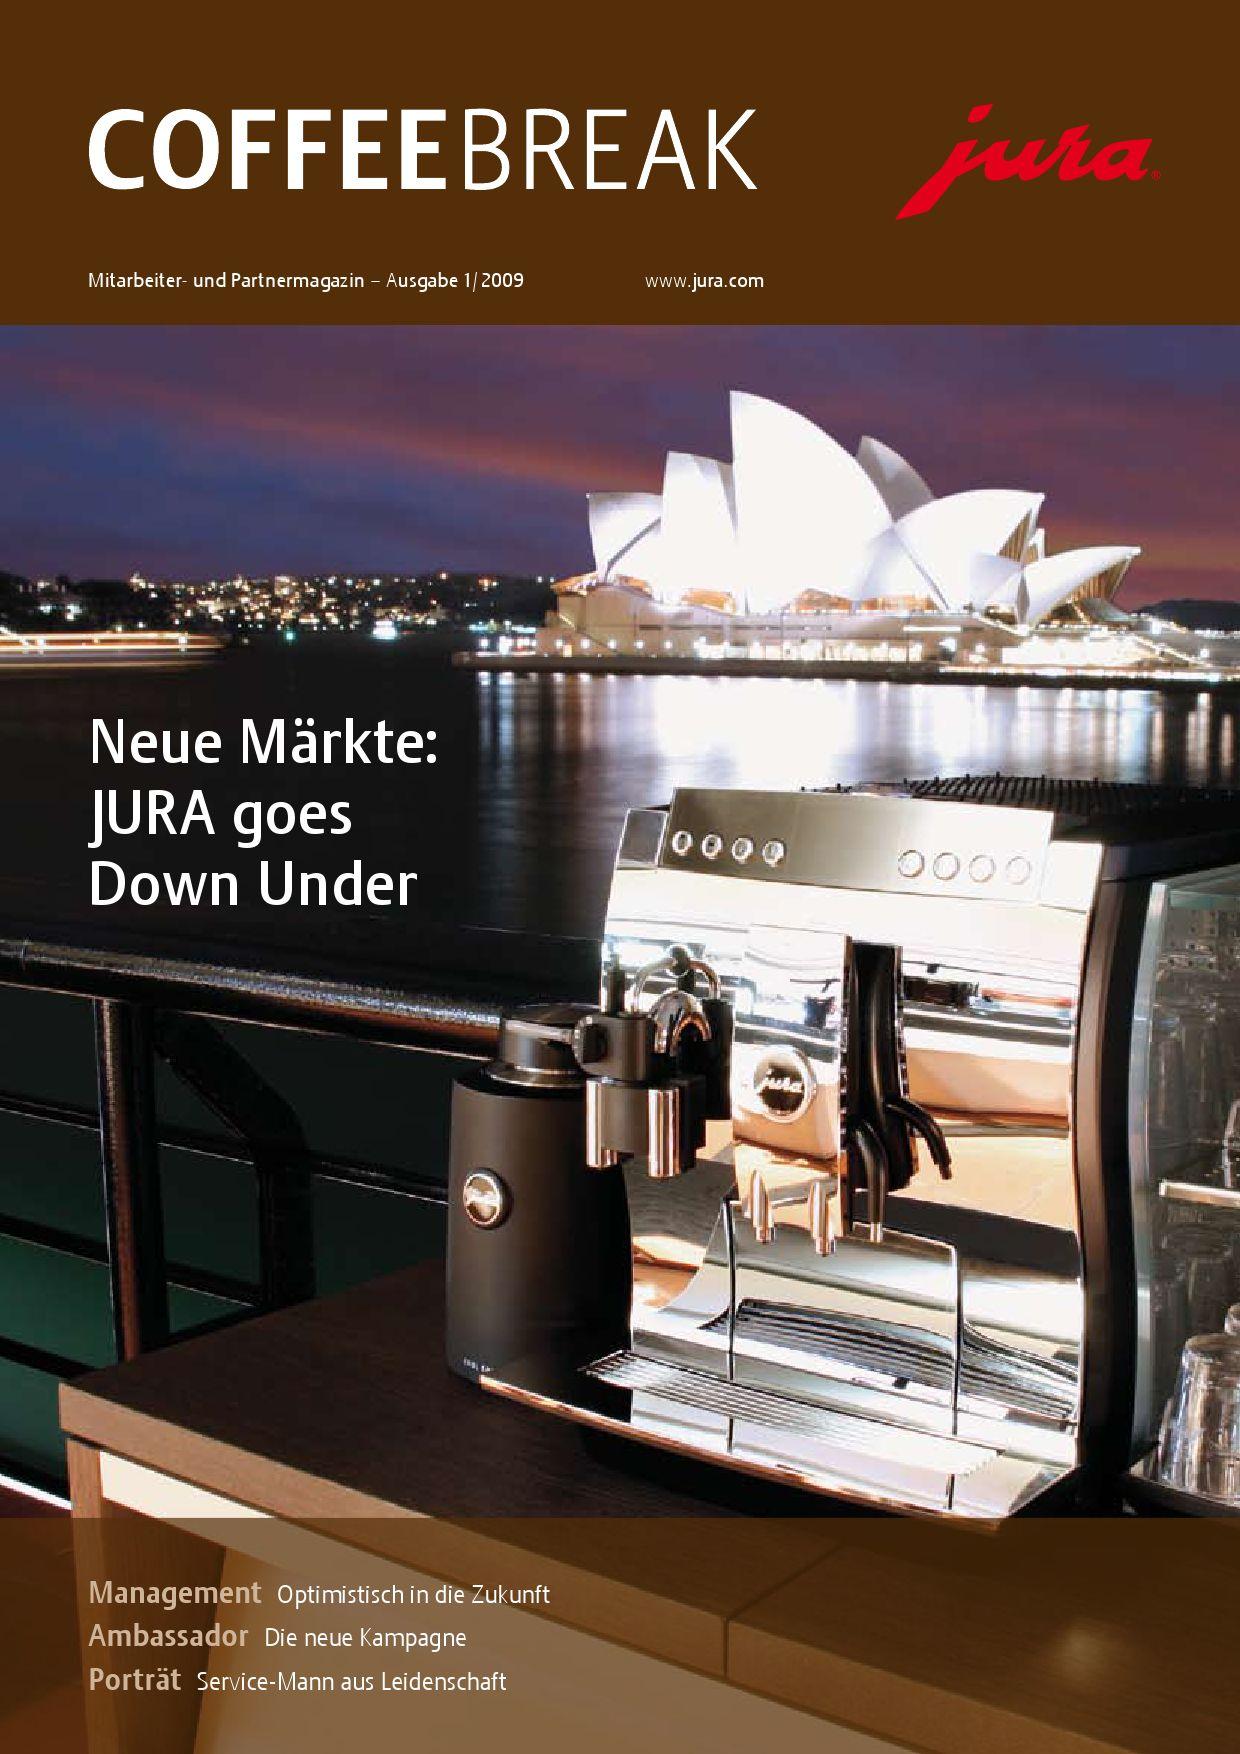 JURA Coffeebreak 1/2009 DE by JURA - issuu